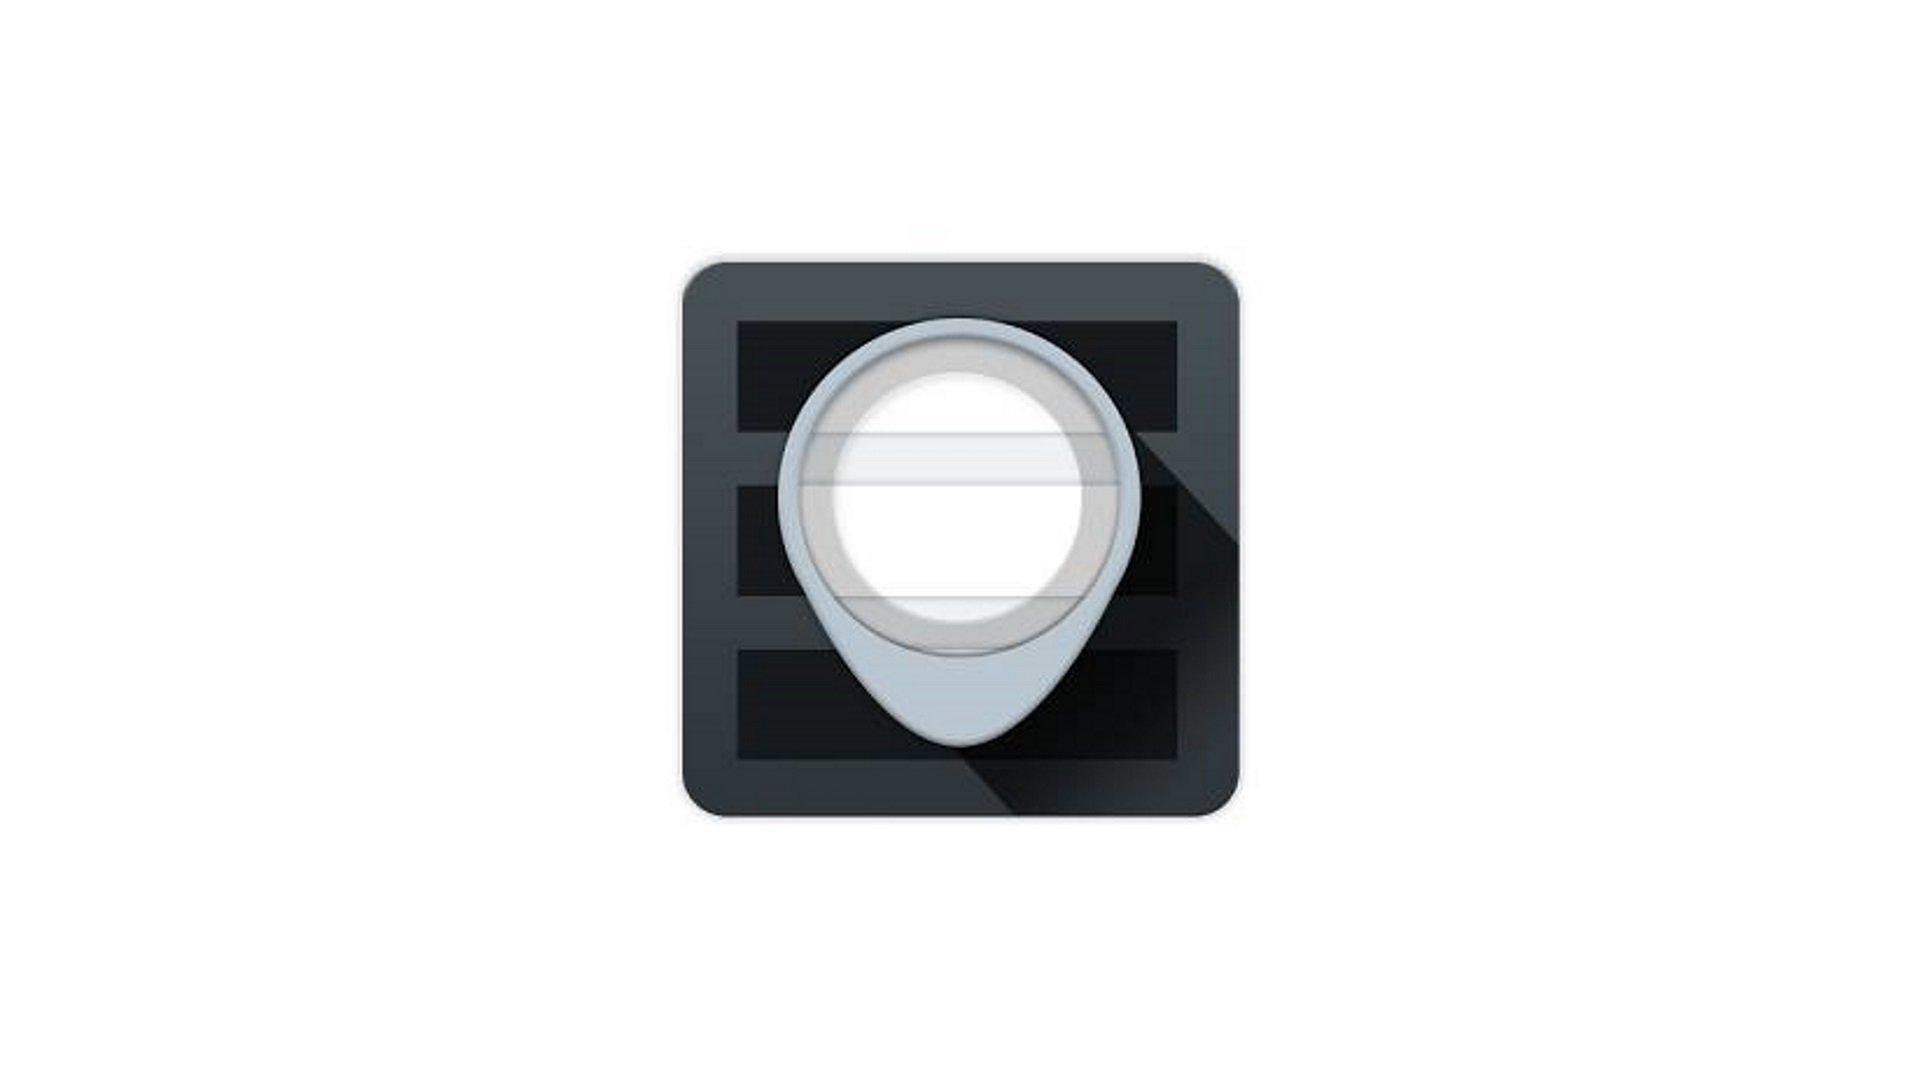 「Privacy Shade」でタッチ中のみ画面表示する方法【KEYone Tips】